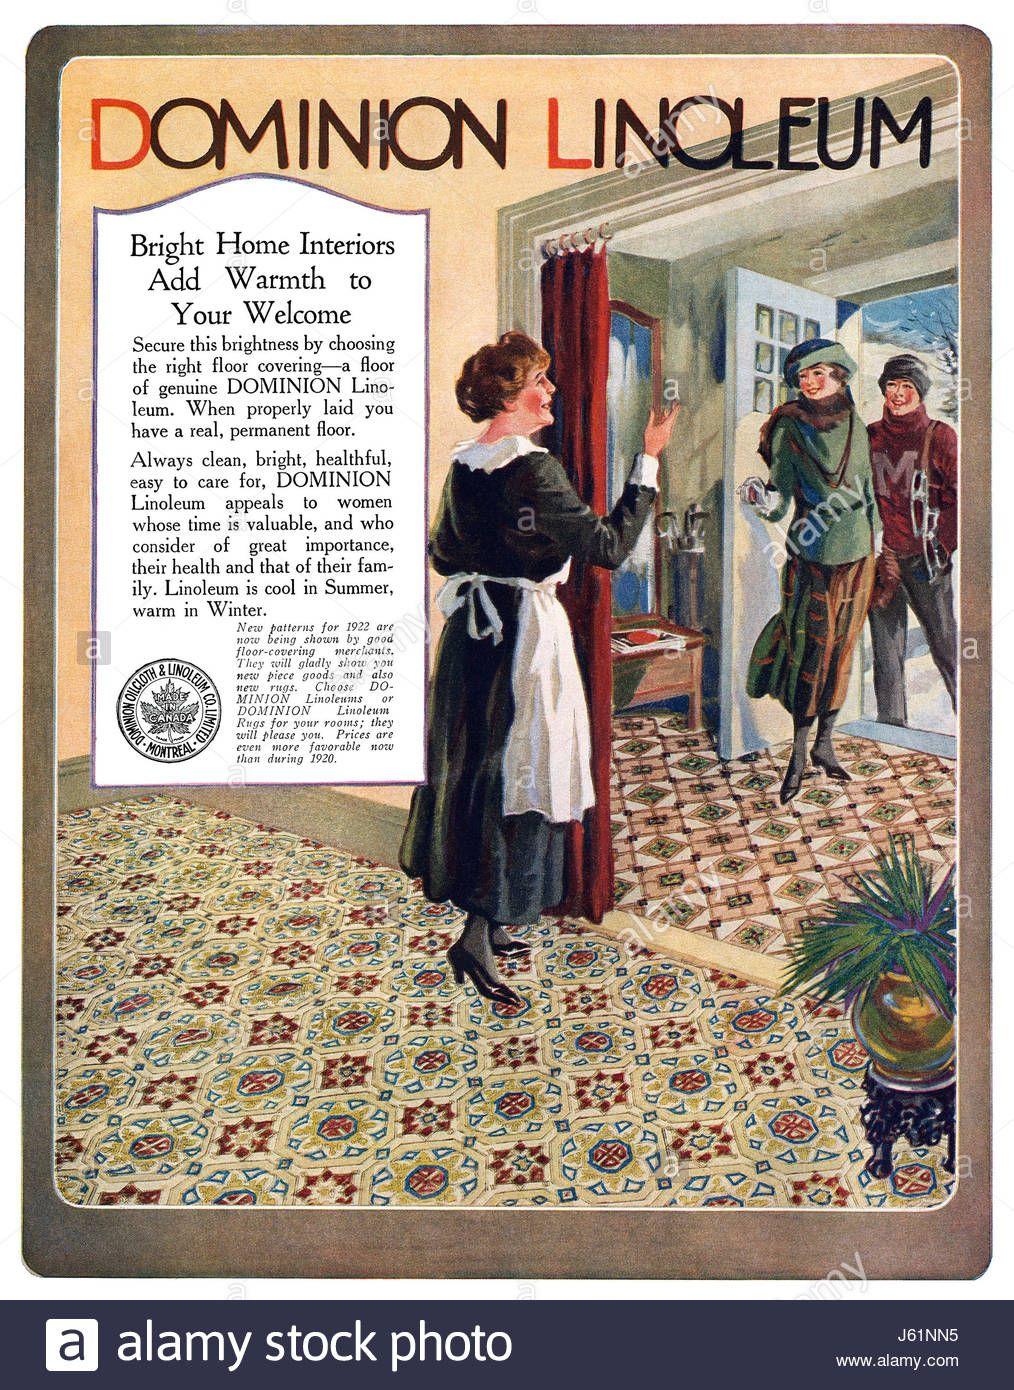 Canadian advertisement for Dominion Linoleum. Publicidad